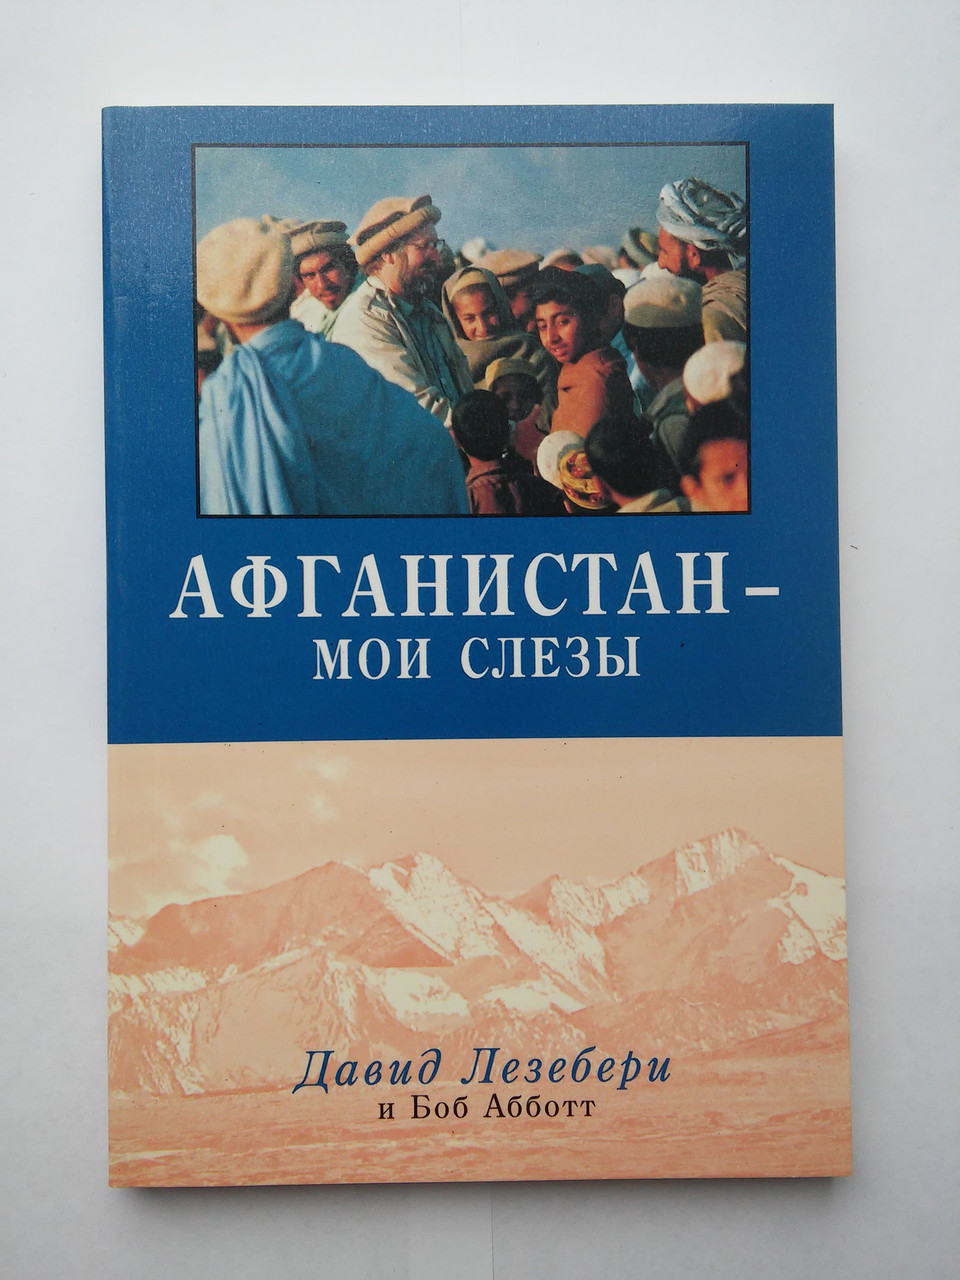 Афганистан – мои слезы Д. Лезебери